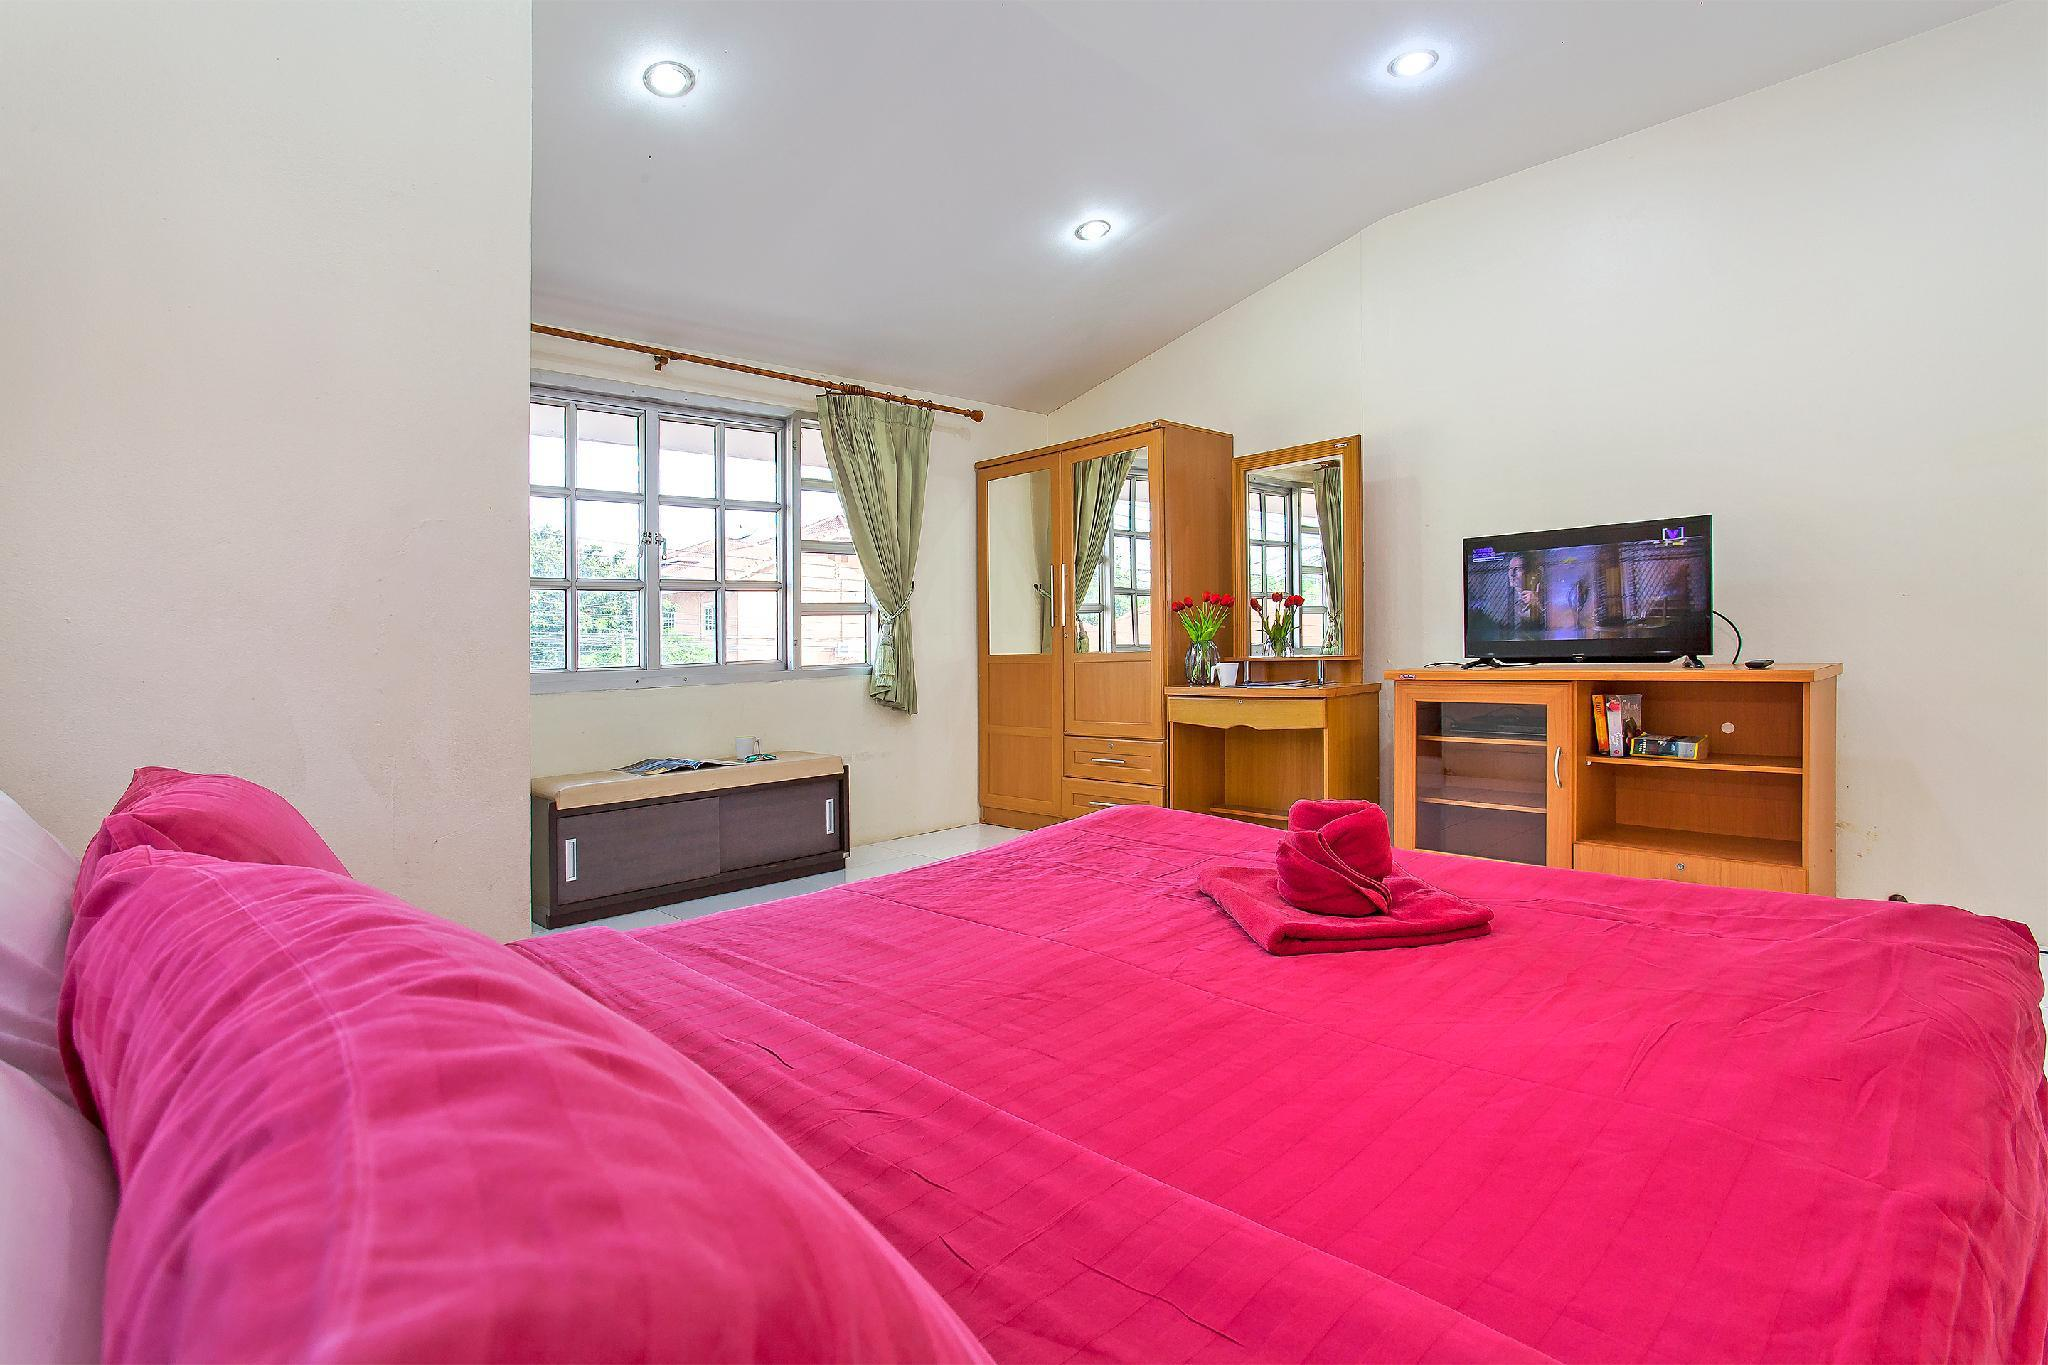 Baan Phailin | Cozy 4 BR Pool Villa, Jomtien Beach วิลลา 4 ห้องนอน 5 ห้องน้ำส่วนตัว ขนาด 148 ตร.ม. – หาดจอมเทียน